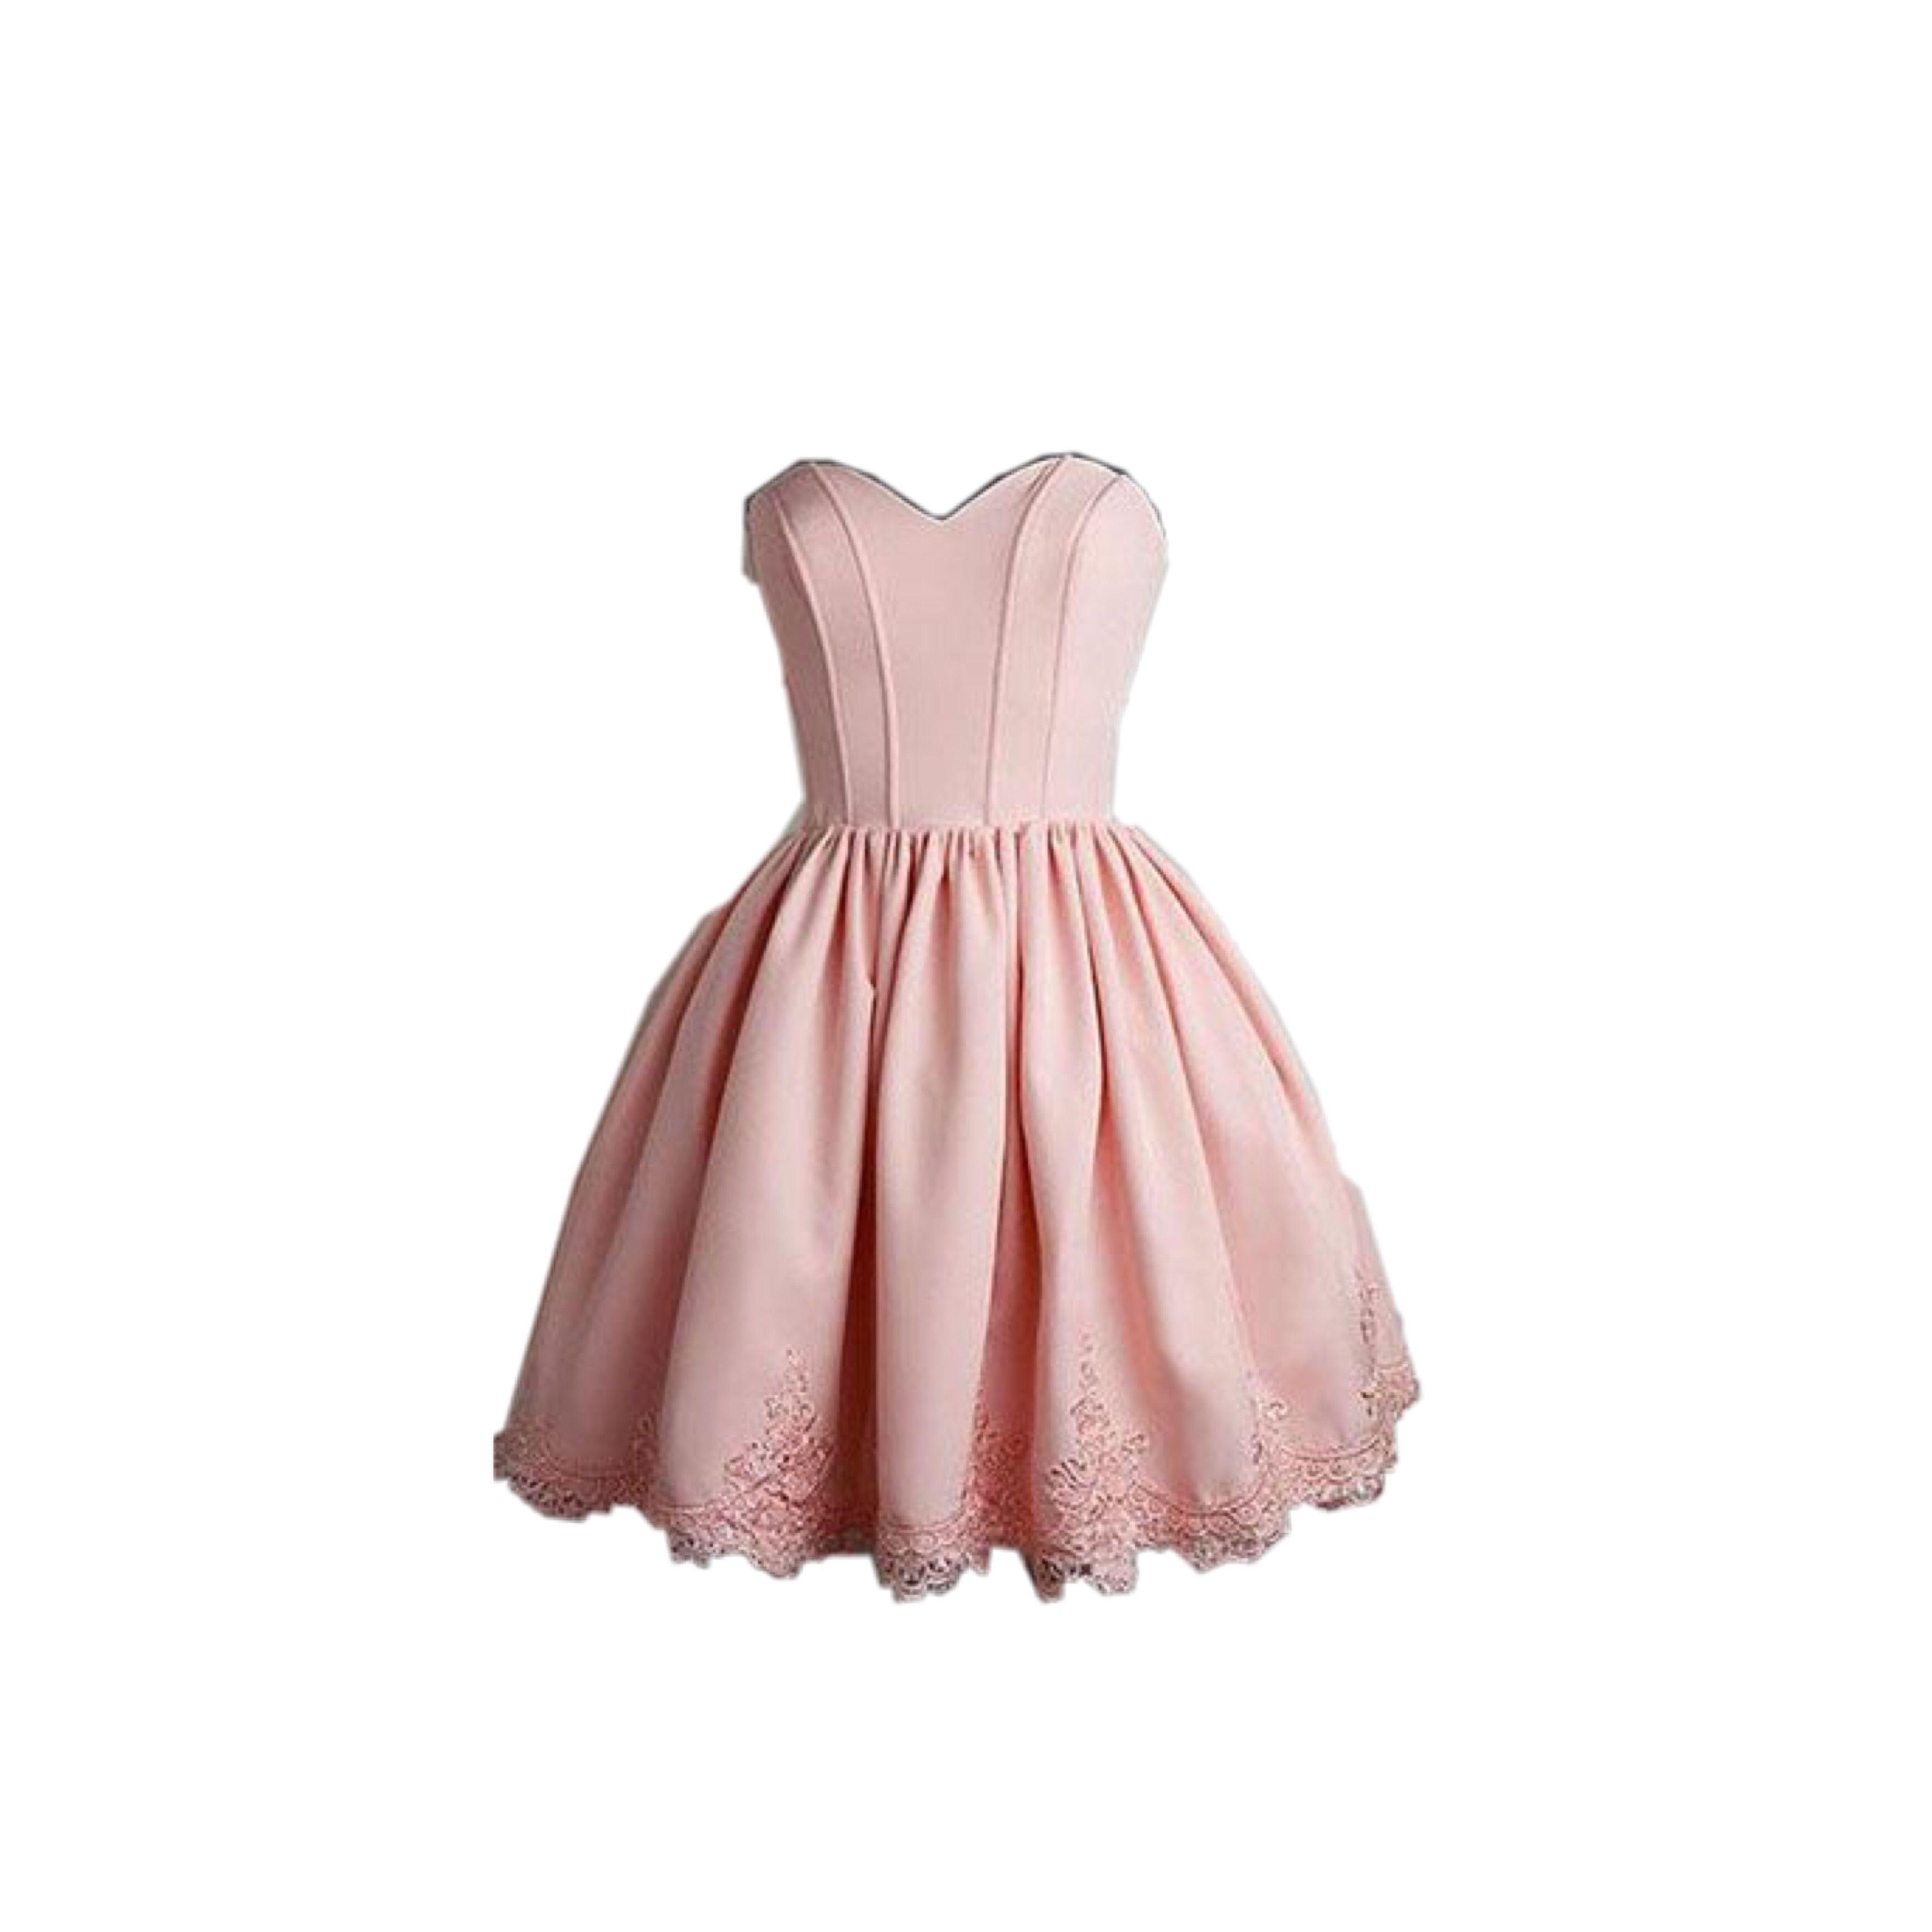 Pink Dress Png Nichememe Pink Egirl Fashion Cute Aesthetic Png Dresses Dress Png Pretty Outfits